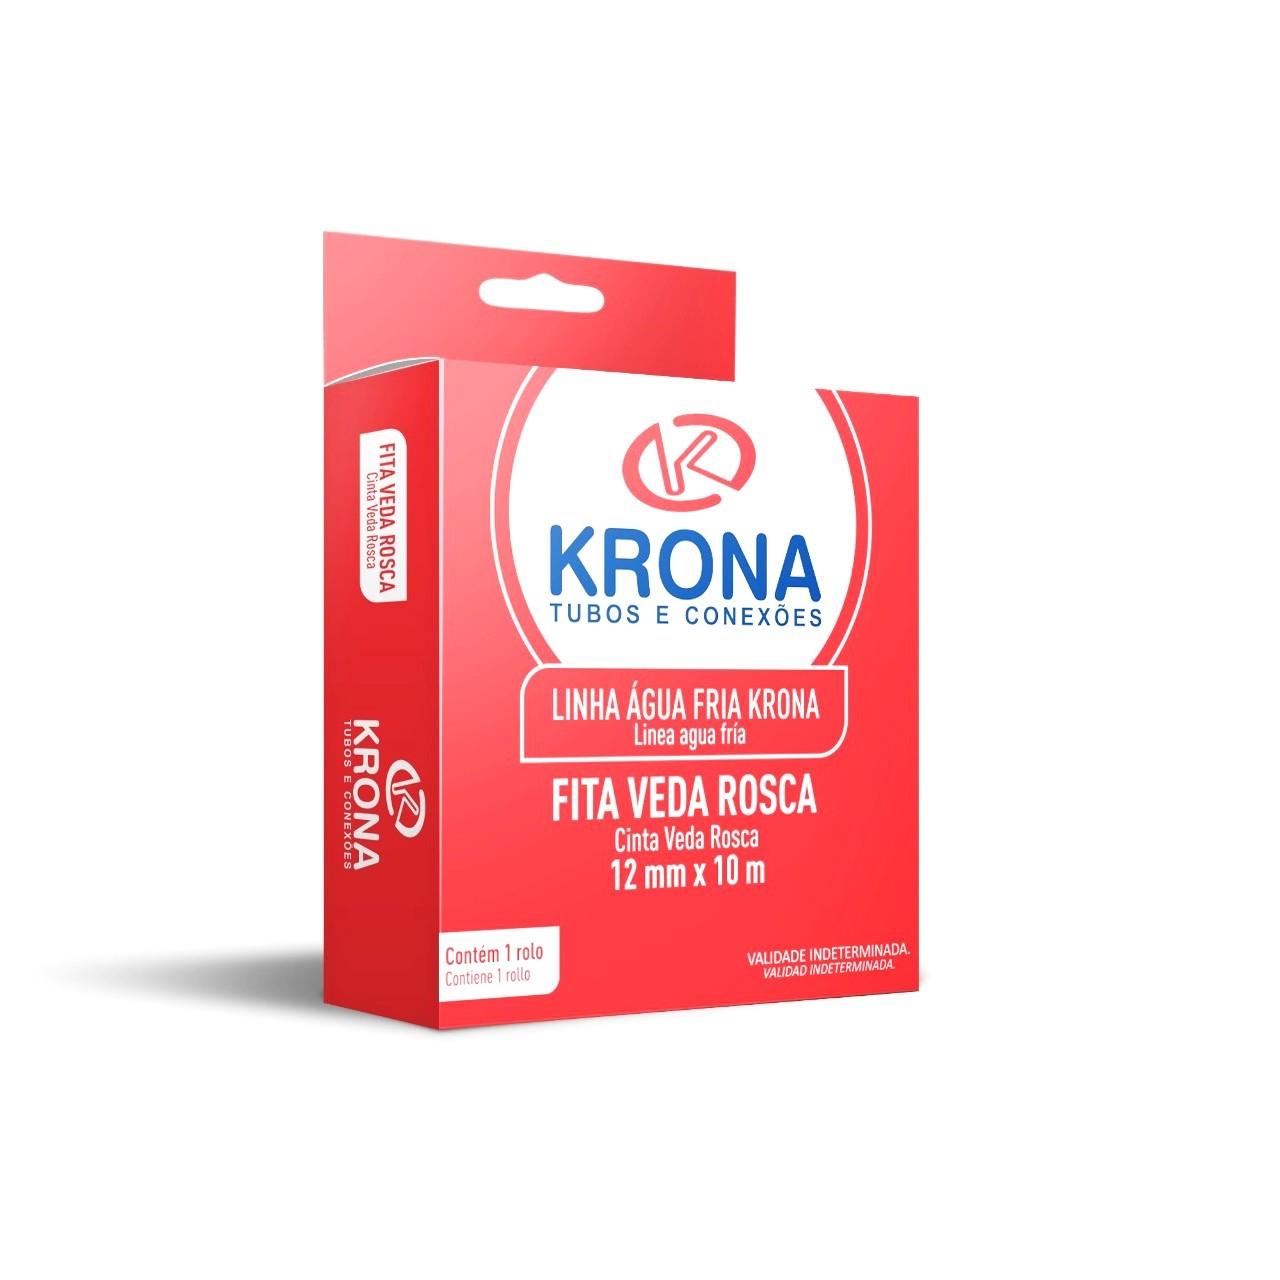 Fita Veda Rosca 18mm x 10m - Krona